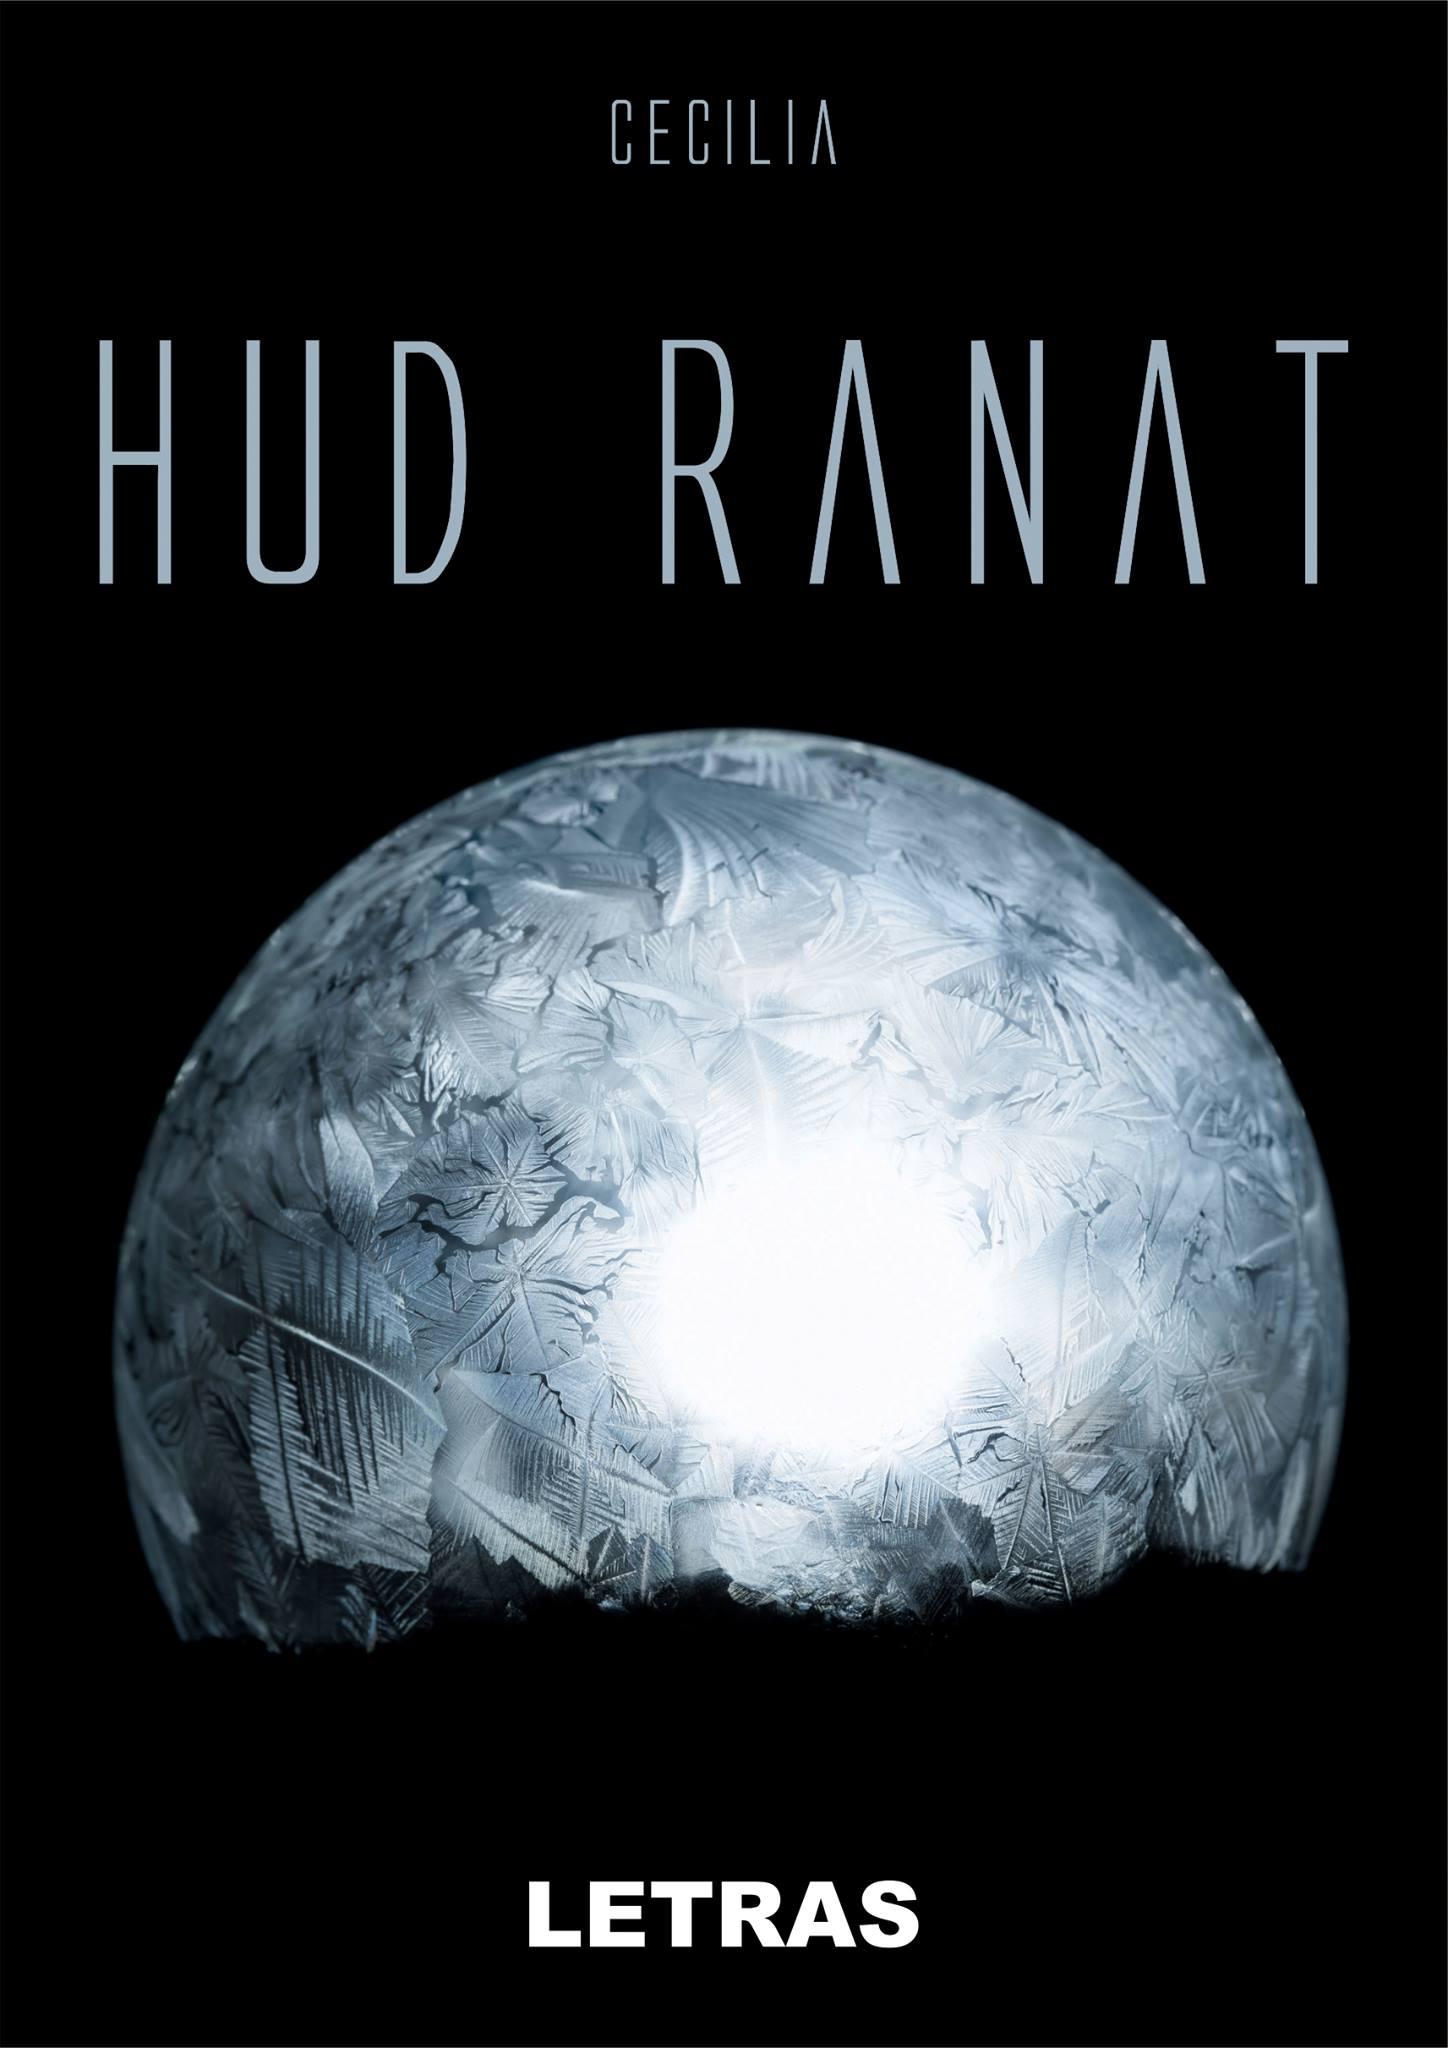 Cecilia Hud Ranat